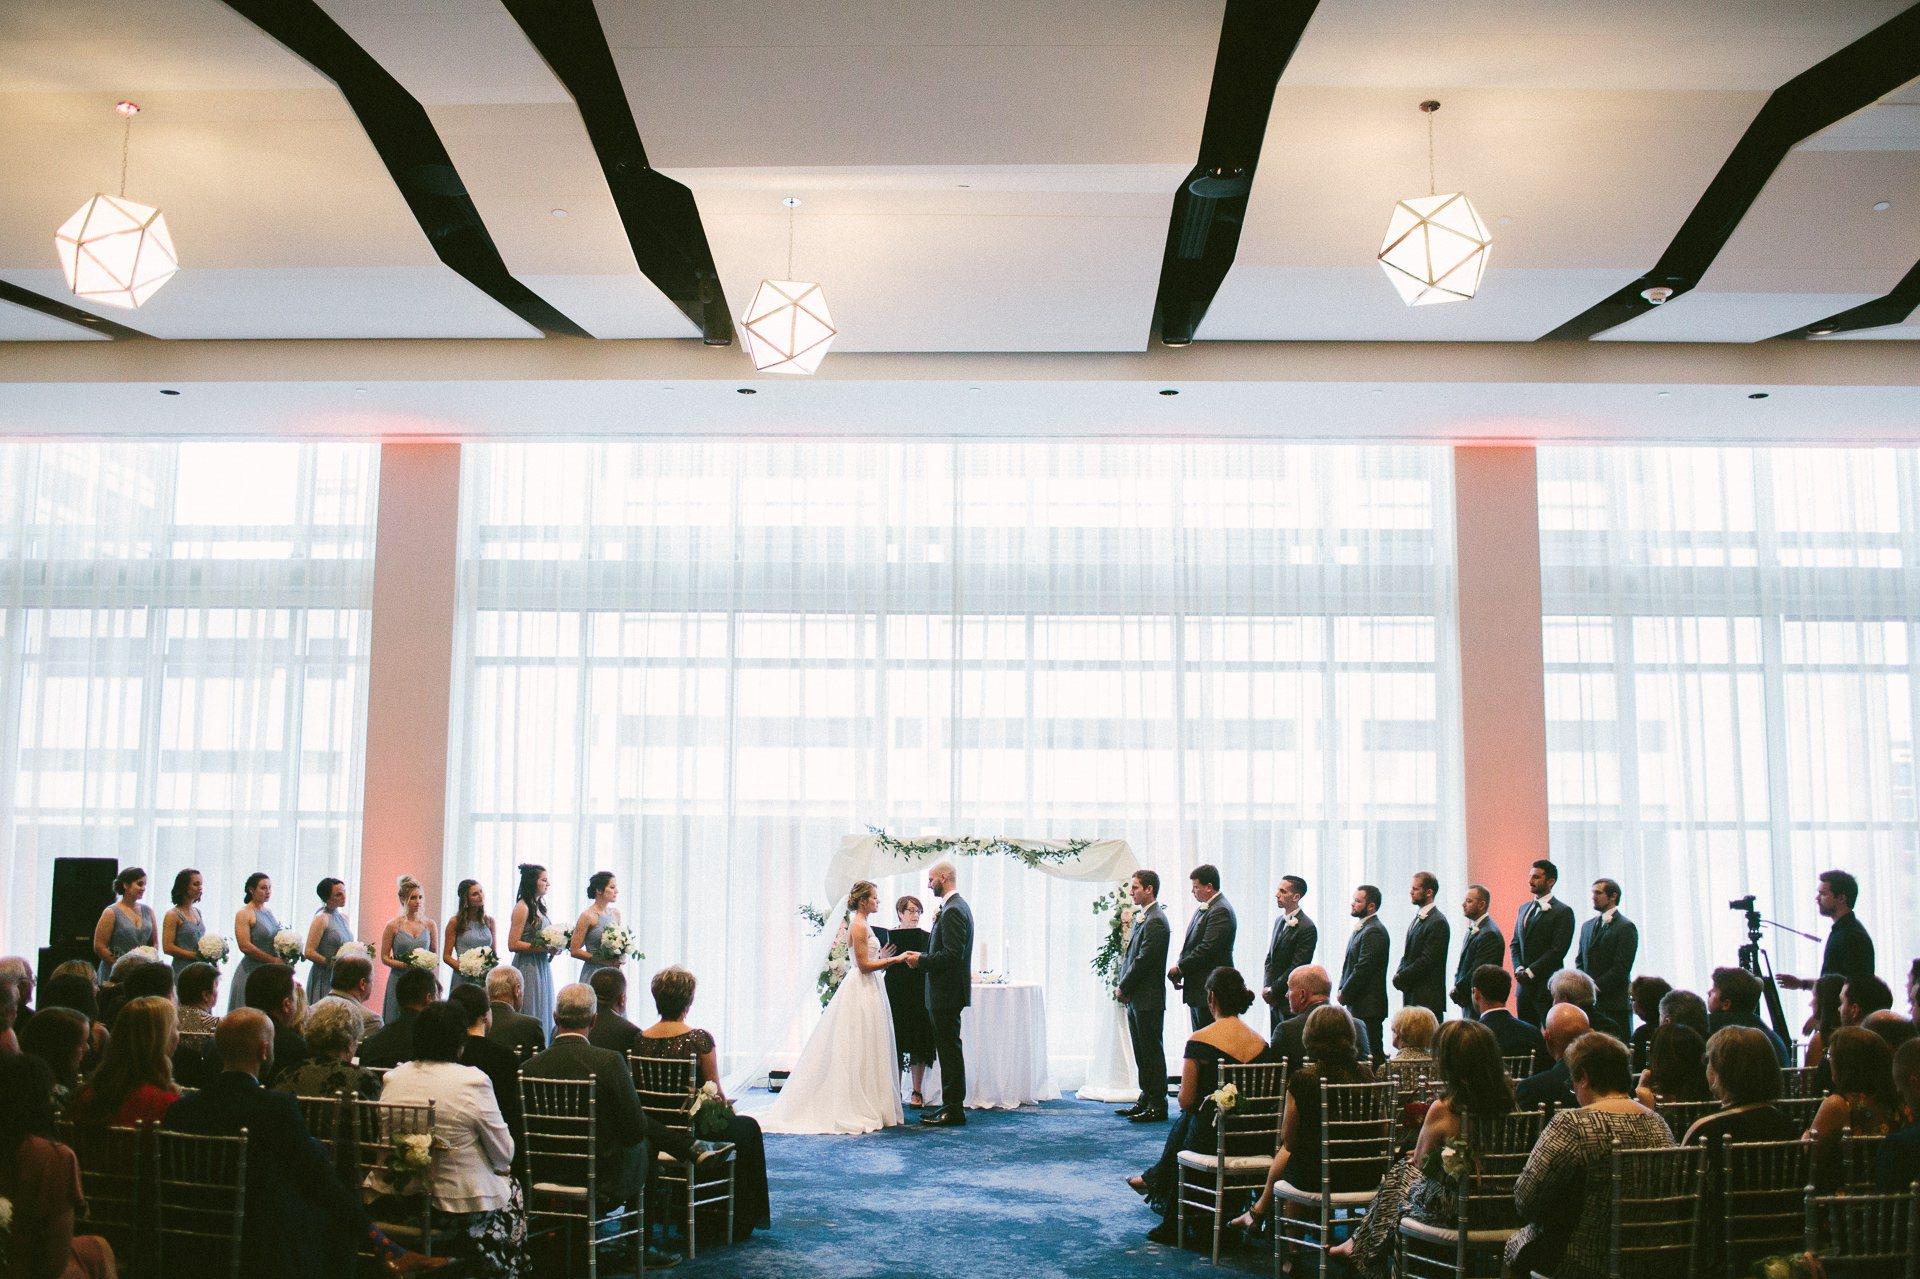 Dowtown Hilton Cleveland Wedding Photographer 2 11.jpg